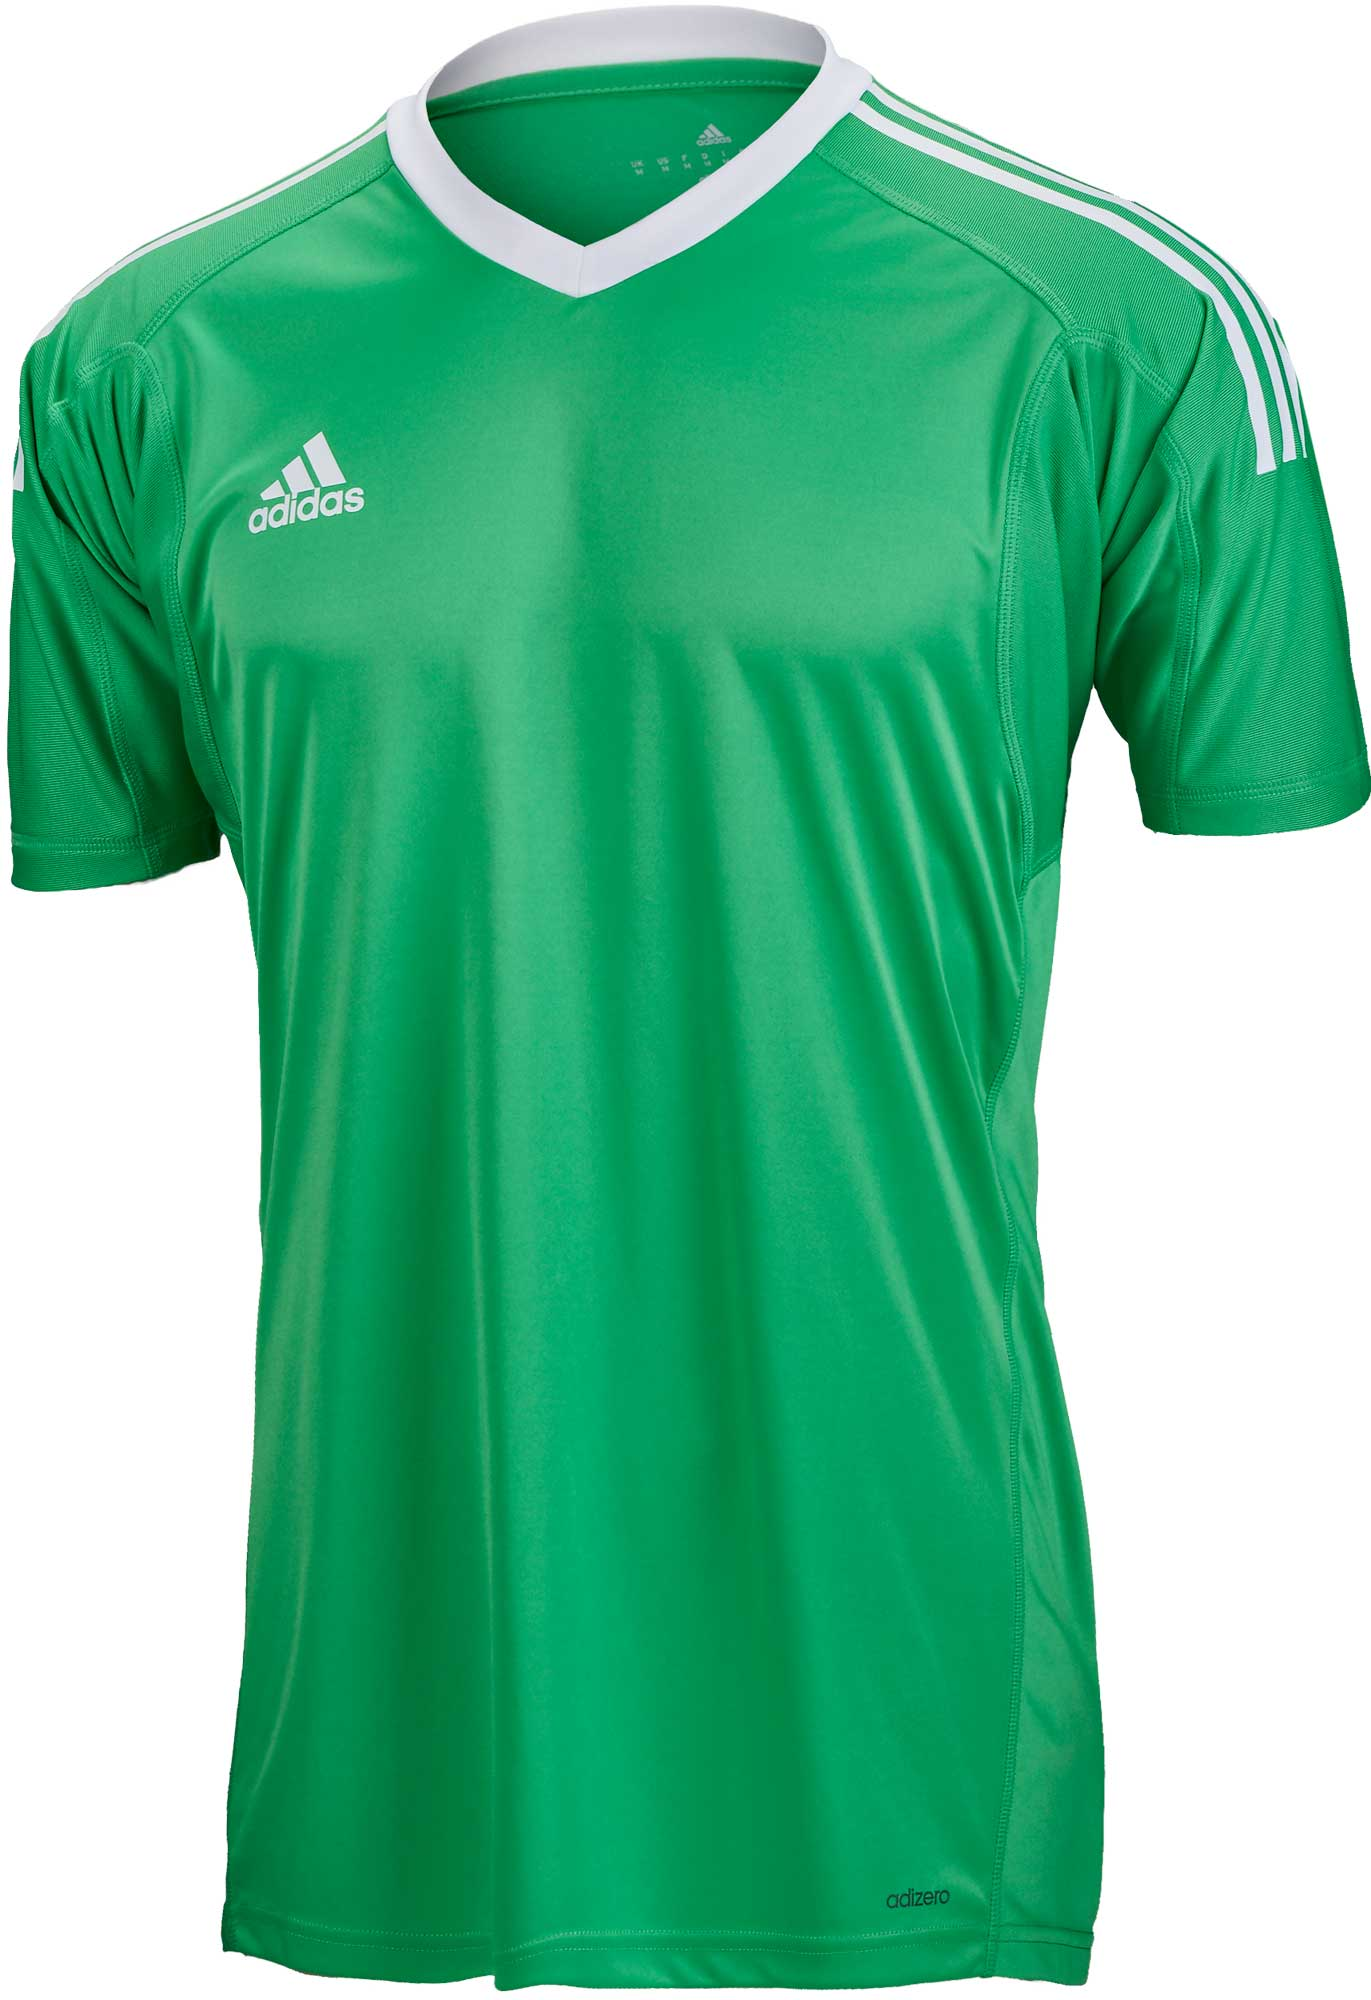 adidas Revigo 17 S/S Goalkeeper Jersey – Energy Green/White